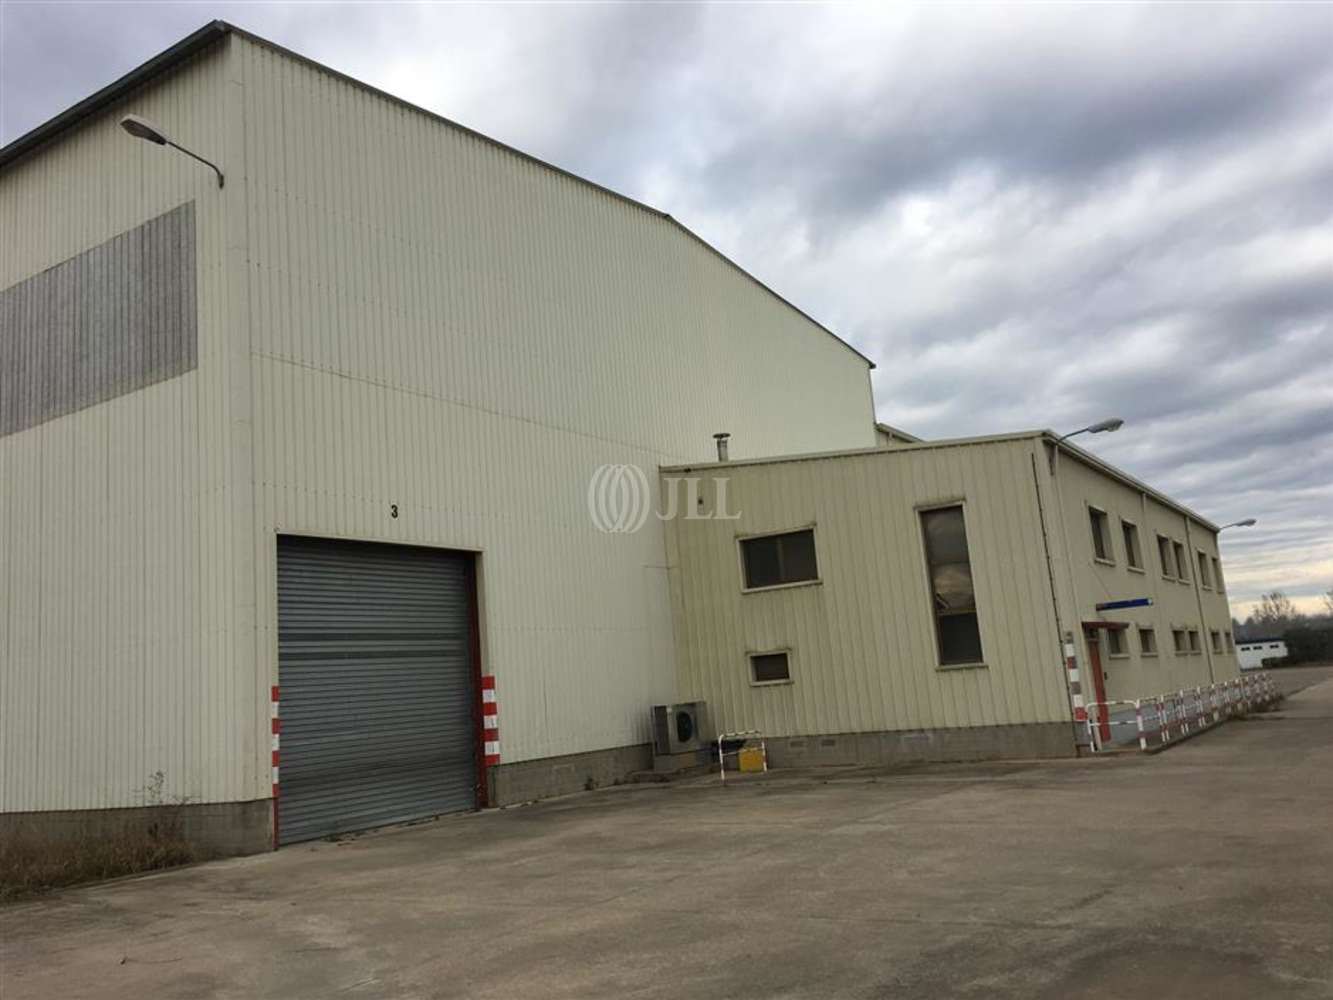 Naves industriales y logísticas Celrà, 17460 - Nave Industrial - B0455 - P.I CELRÀ - 9376